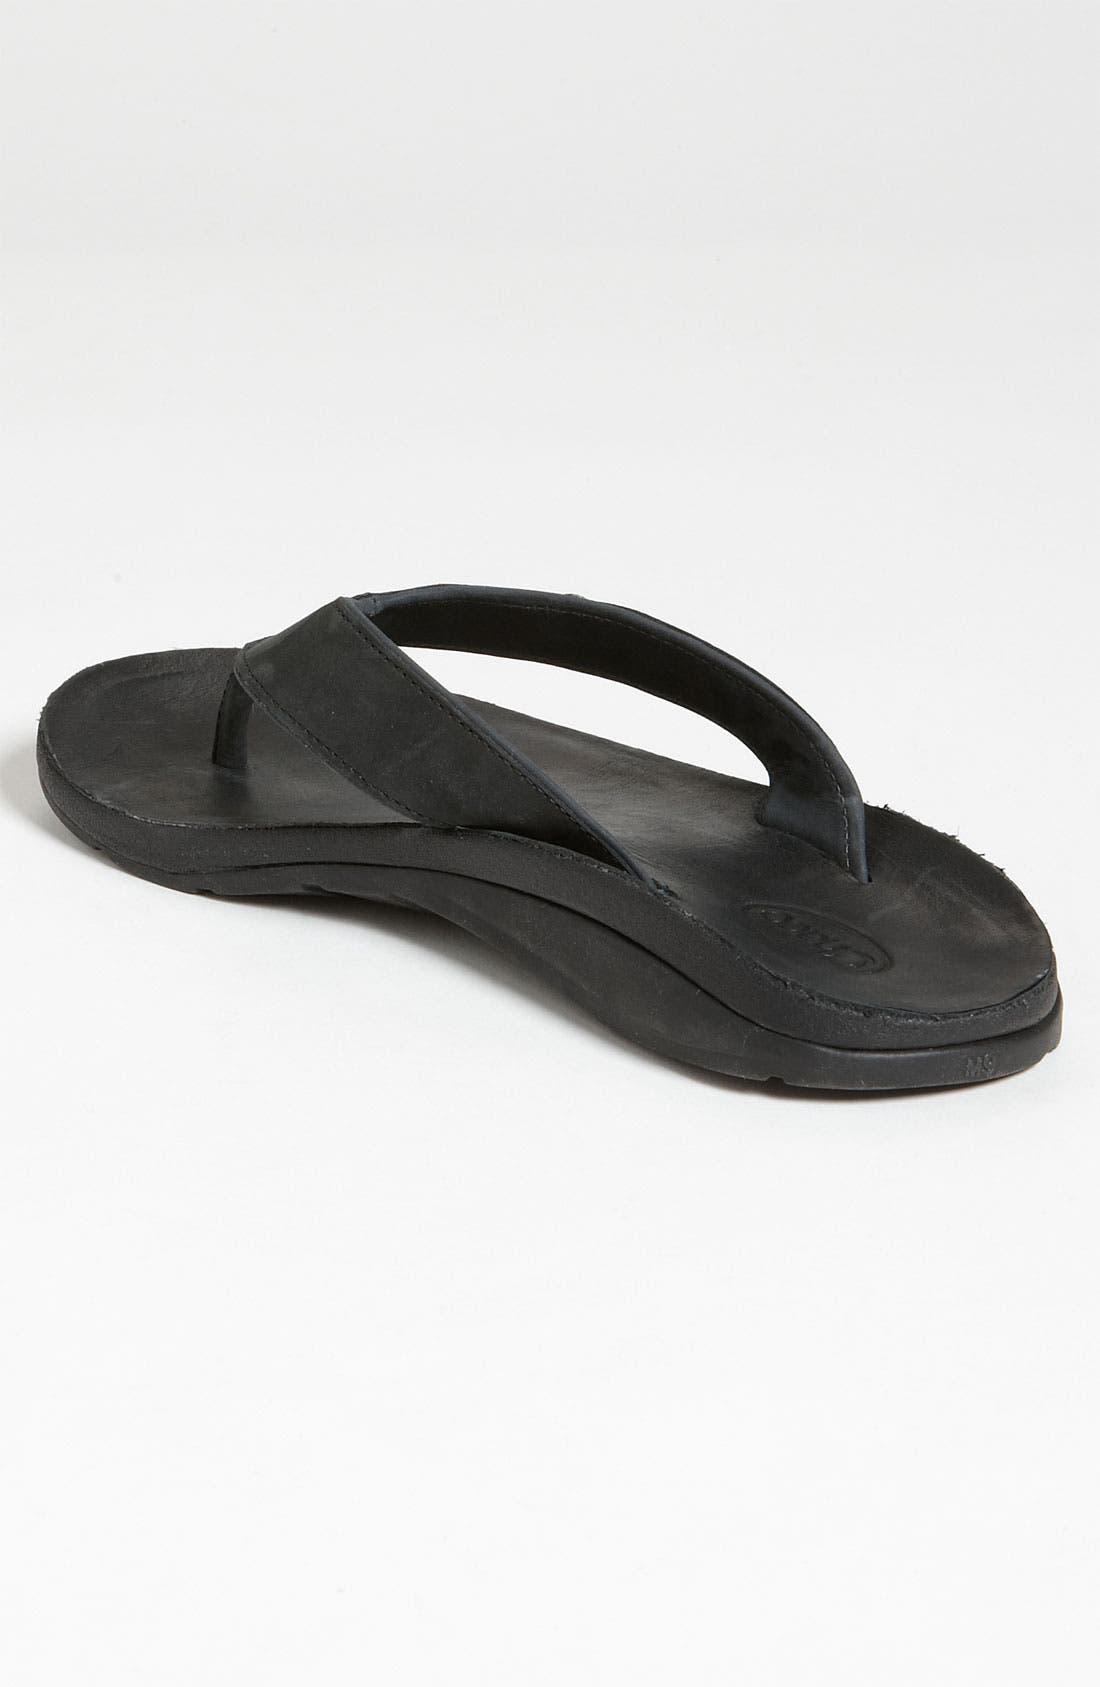 Alternate Image 2  - Chaco 'Cordonazo' Flip Flop